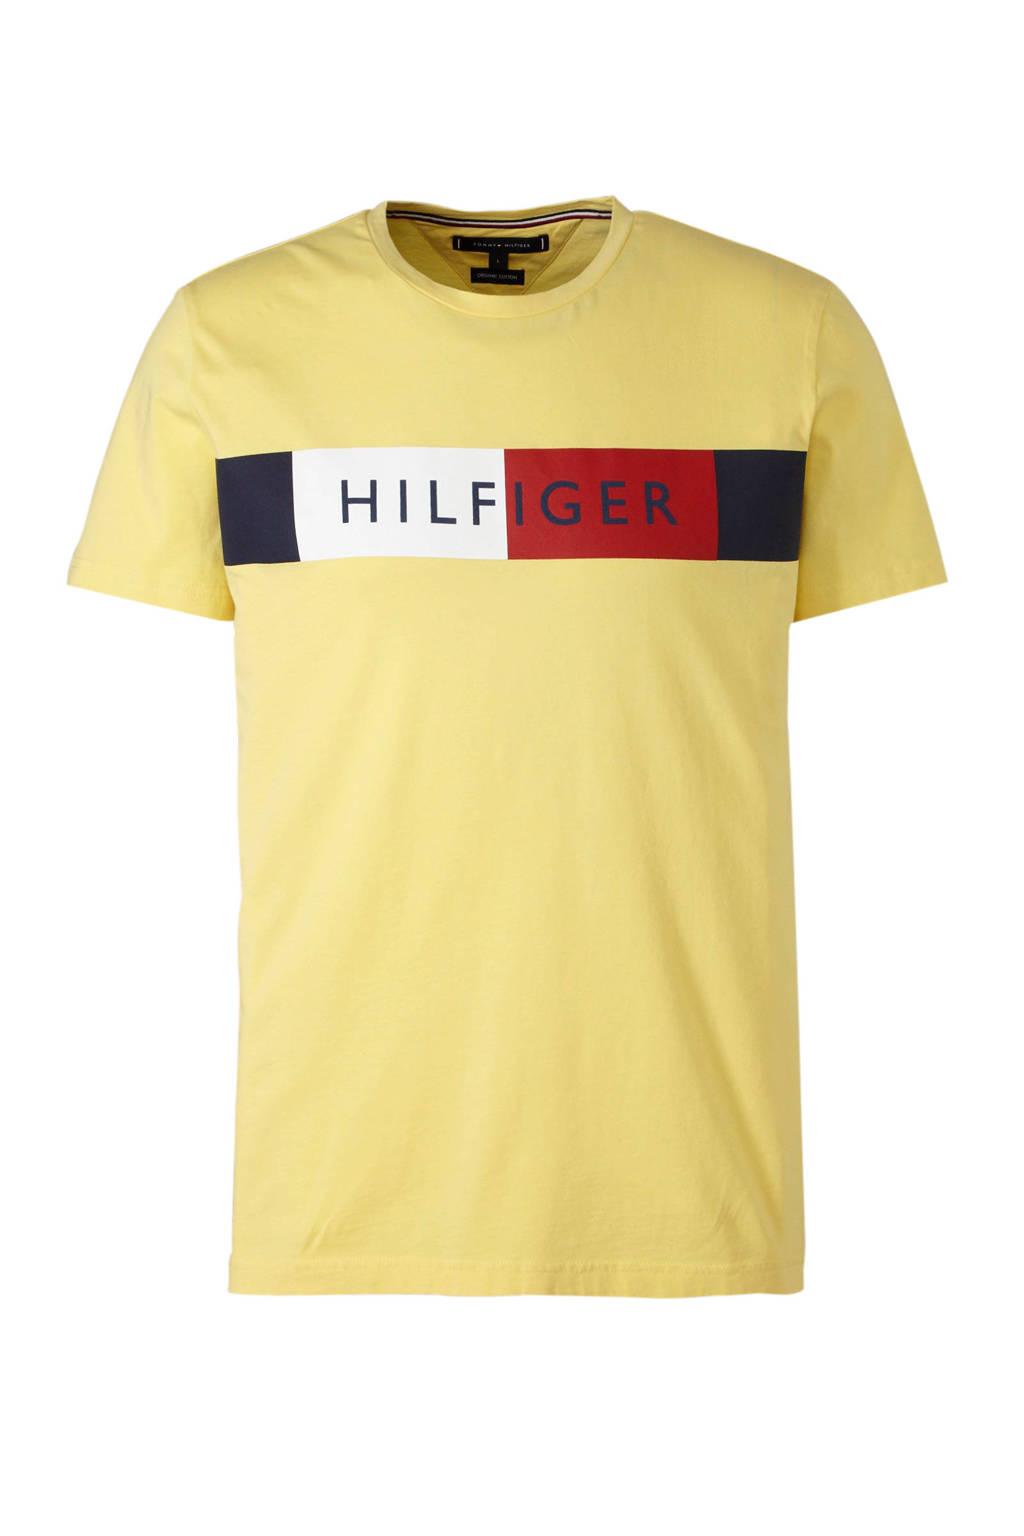 Tommy Hilfiger T-shirt met logo geel, Geel